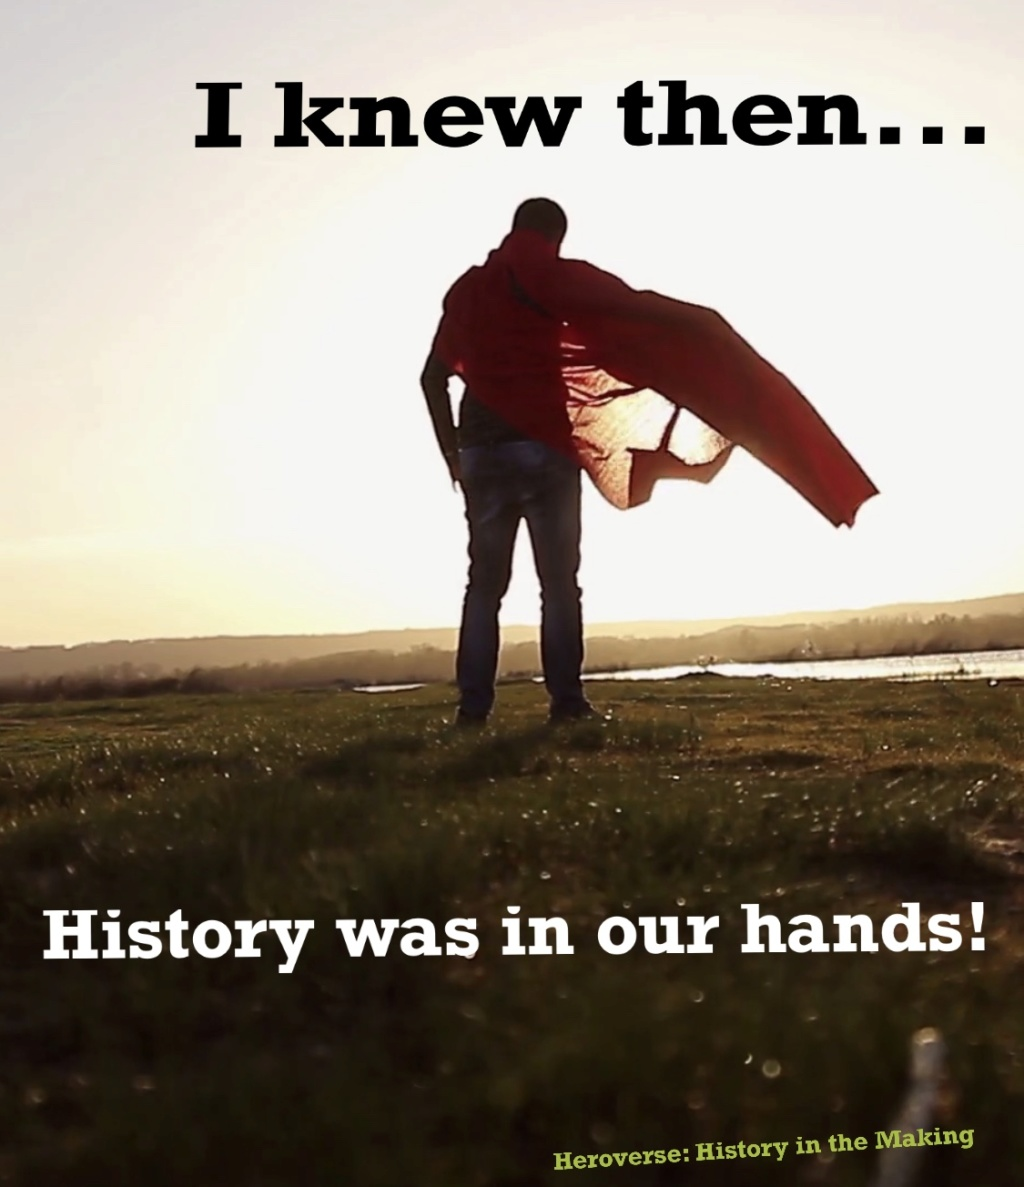 Heroverse: History in the Making Aebada10